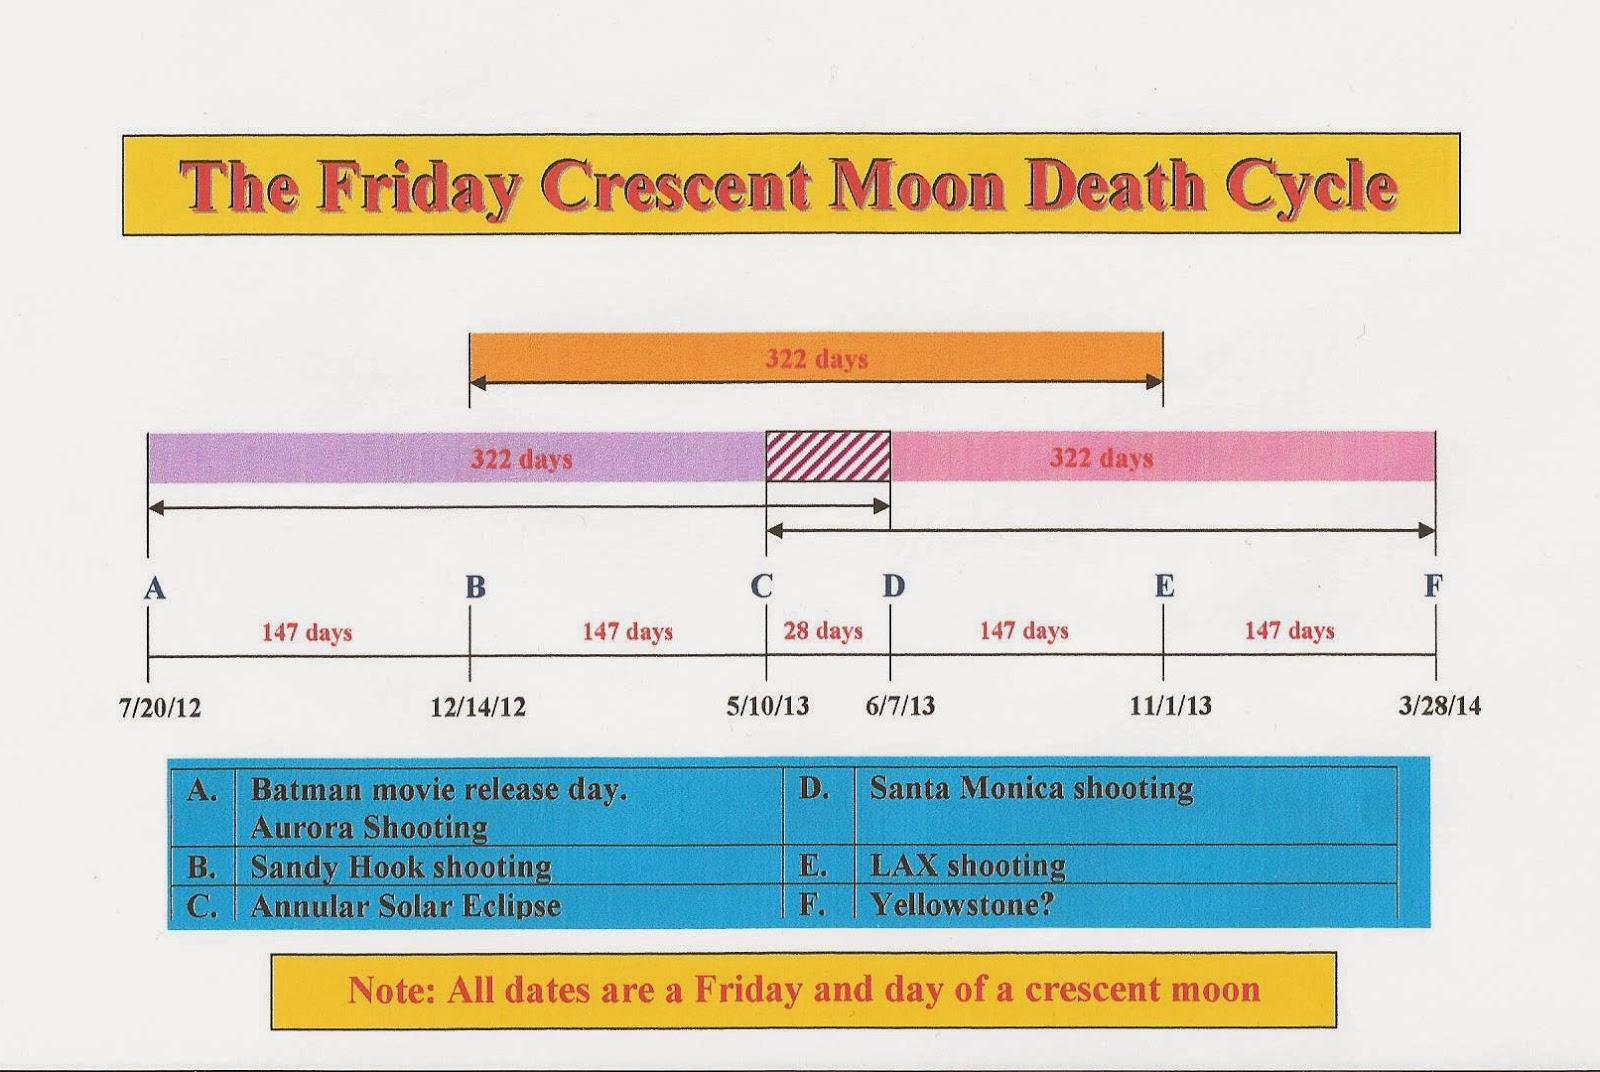 http://1.bp.blogspot.com/-CgFT9HoEEQA/Uo67Ji3gCKI/AAAAAAAAC4I/4gsnGrTvqNw/s1600/Friday+Crescent+Moon+Death+Day+Chart.jpg